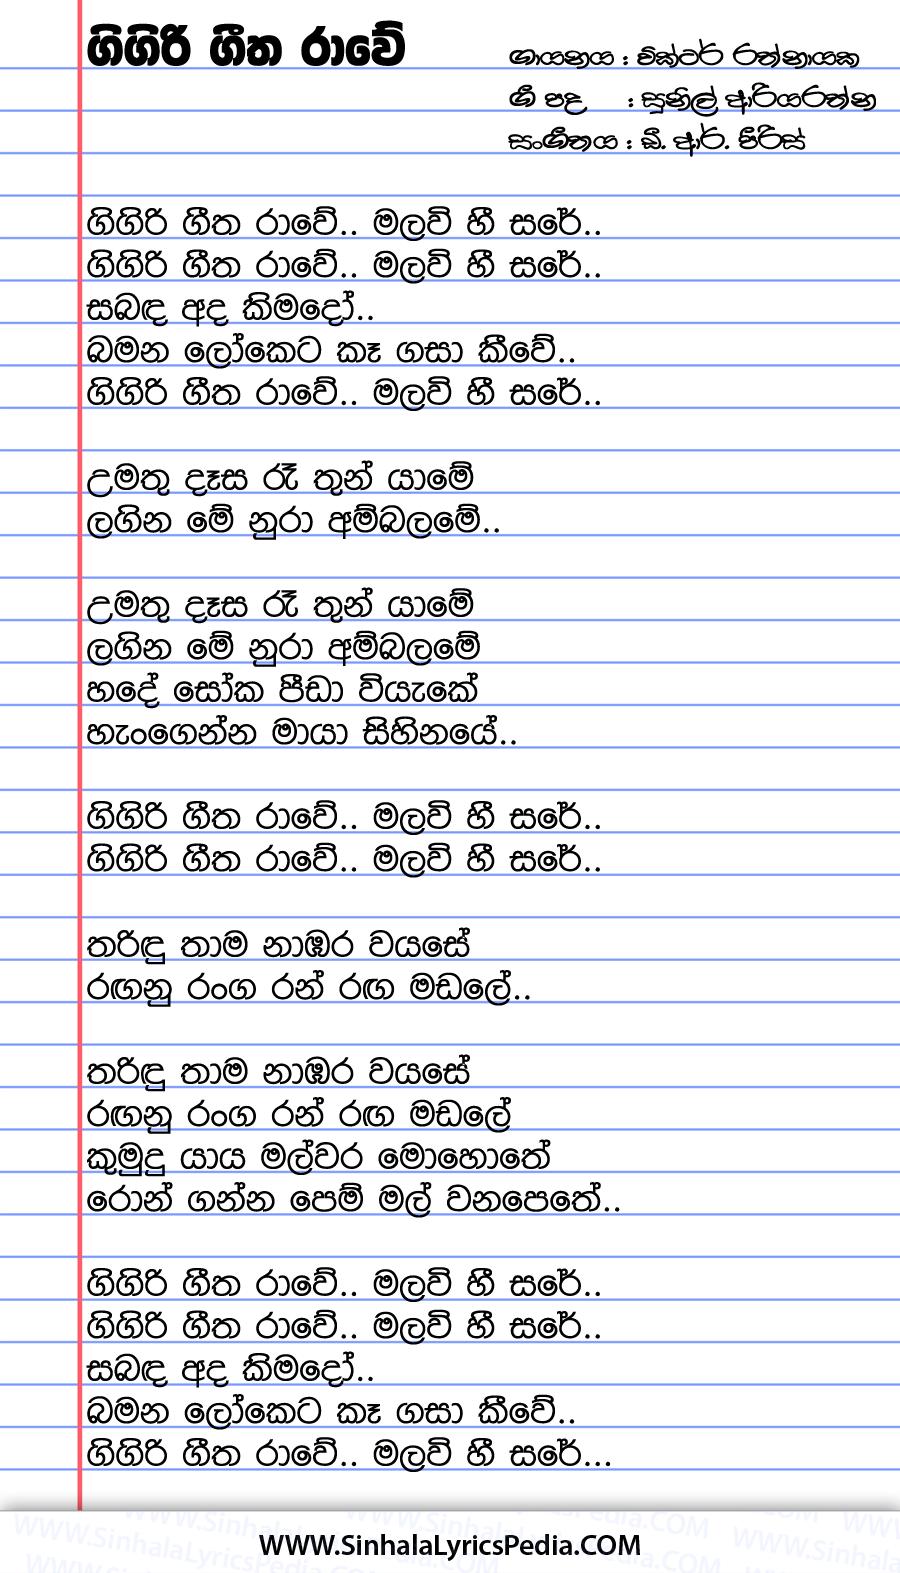 Gigiri Geetha Rawe Song Lyrics